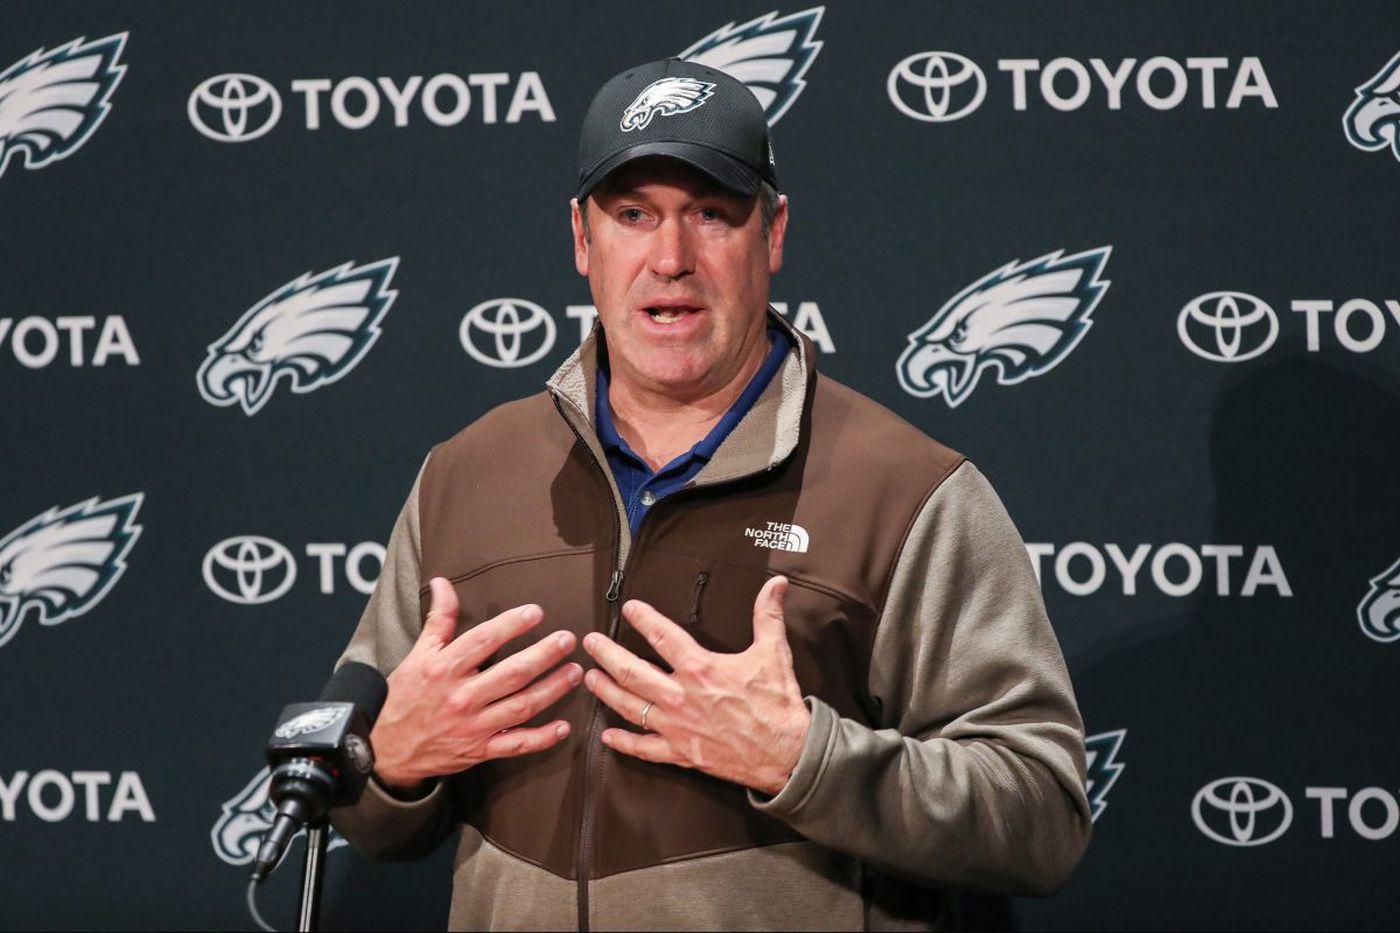 Eagles coach Doug Pederson press conference - live video